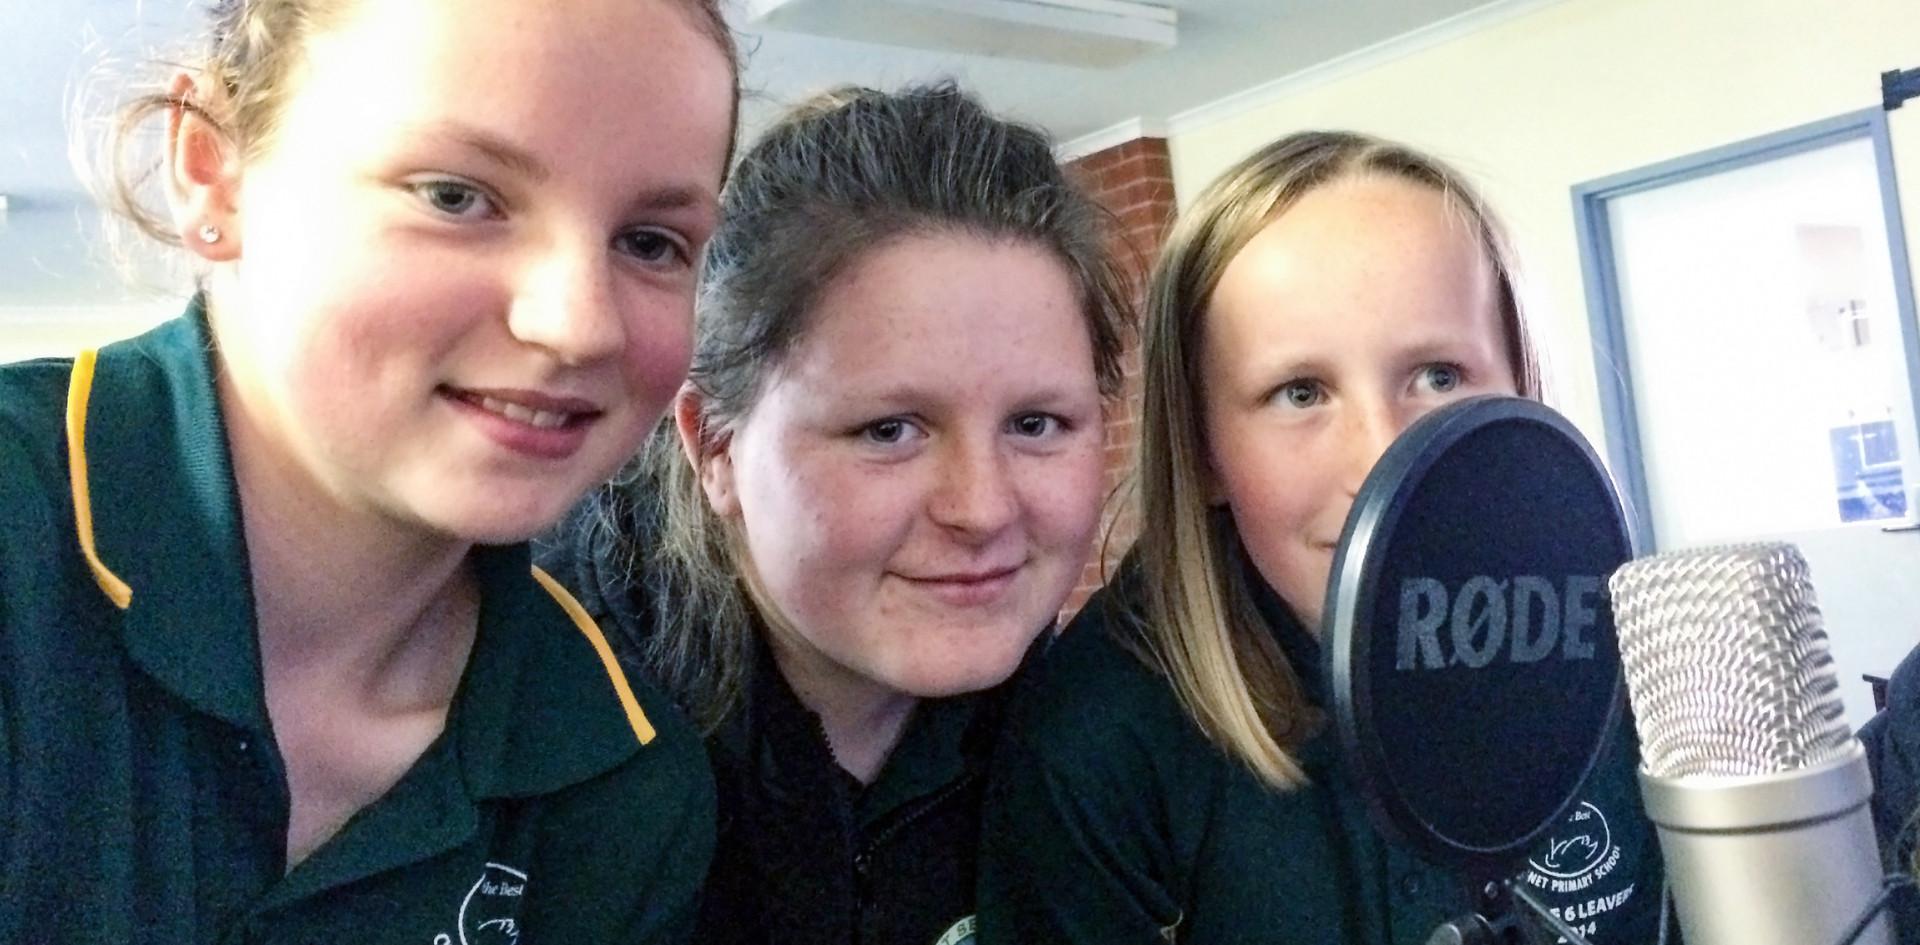 Cygnet school girls telling their story.